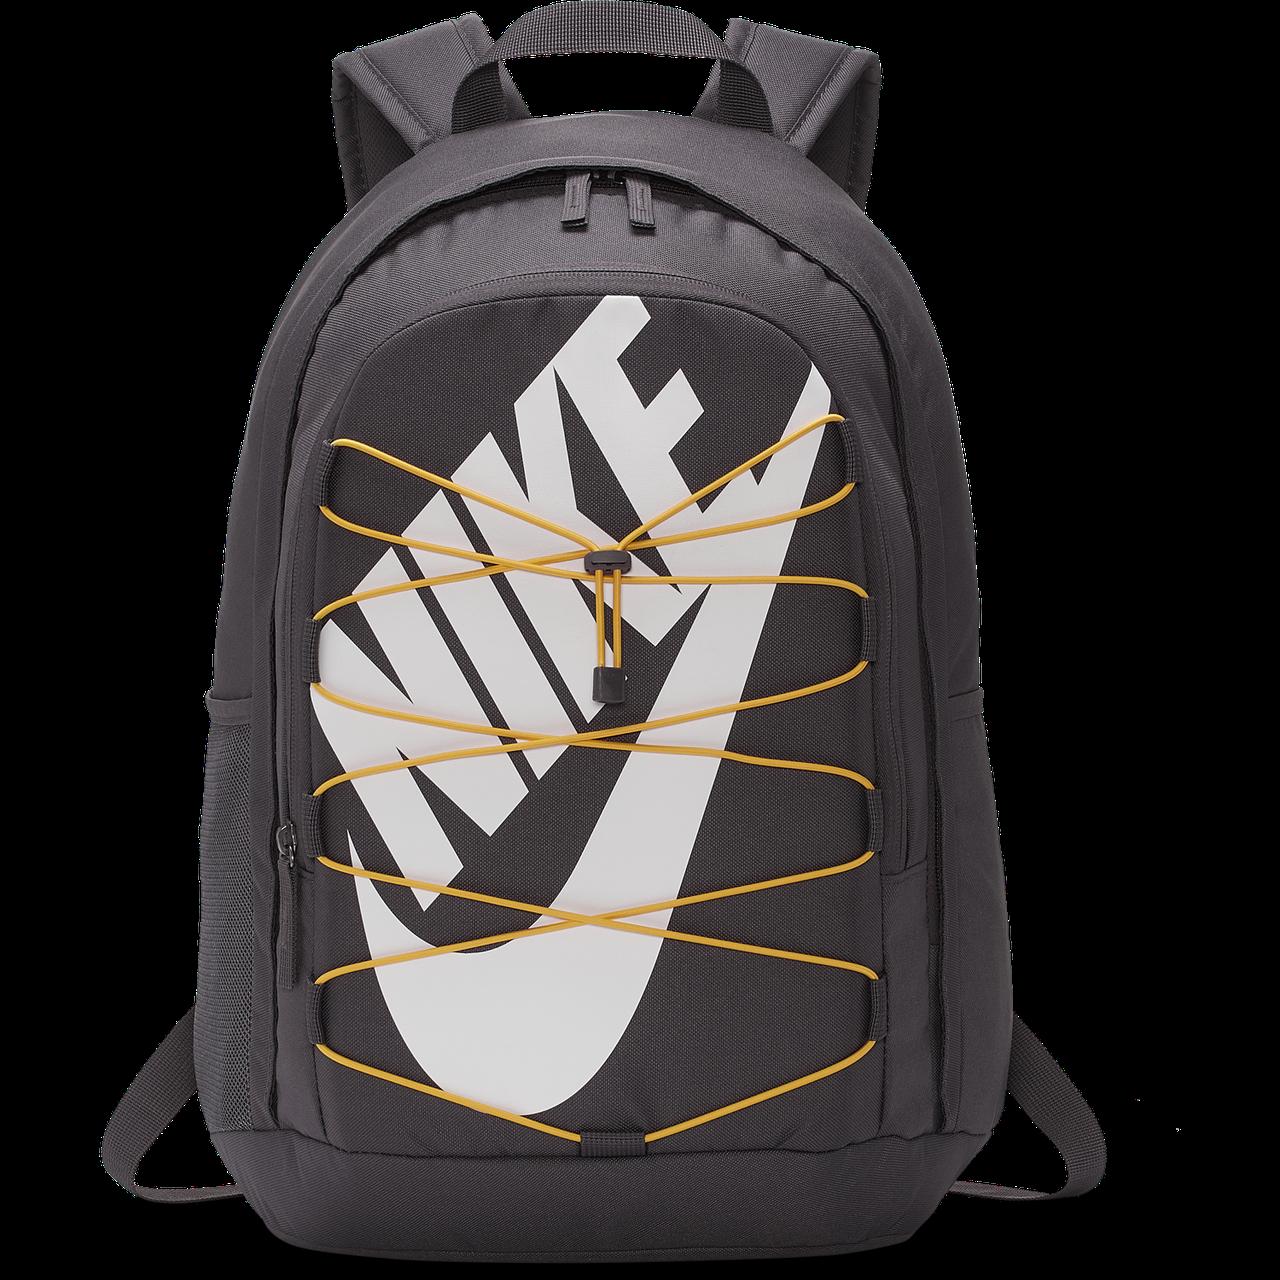 Рюкзак Nike Hayward Backpack 2.0 BA5883-082 Черный (193145973480)